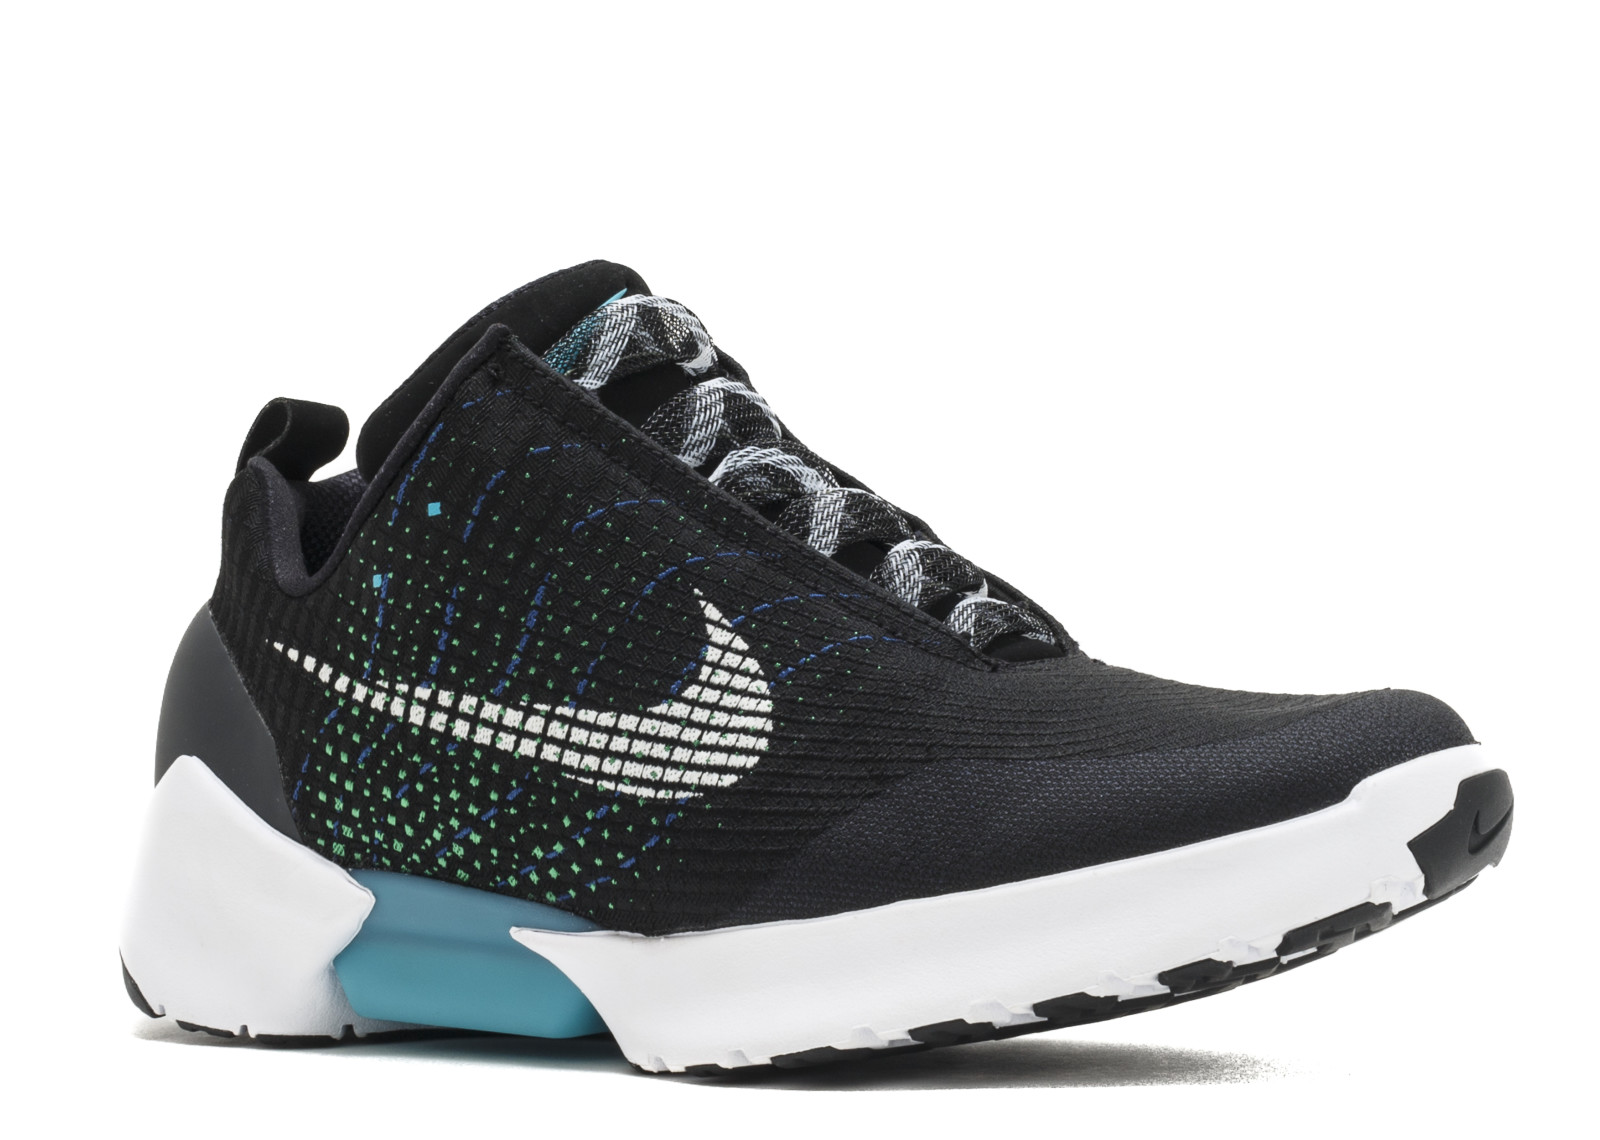 eterno Leche gemelo  Nike - HYPER ADAPT 1.0 'EARL' - 843871-001 - Walmart.com - Walmart.com